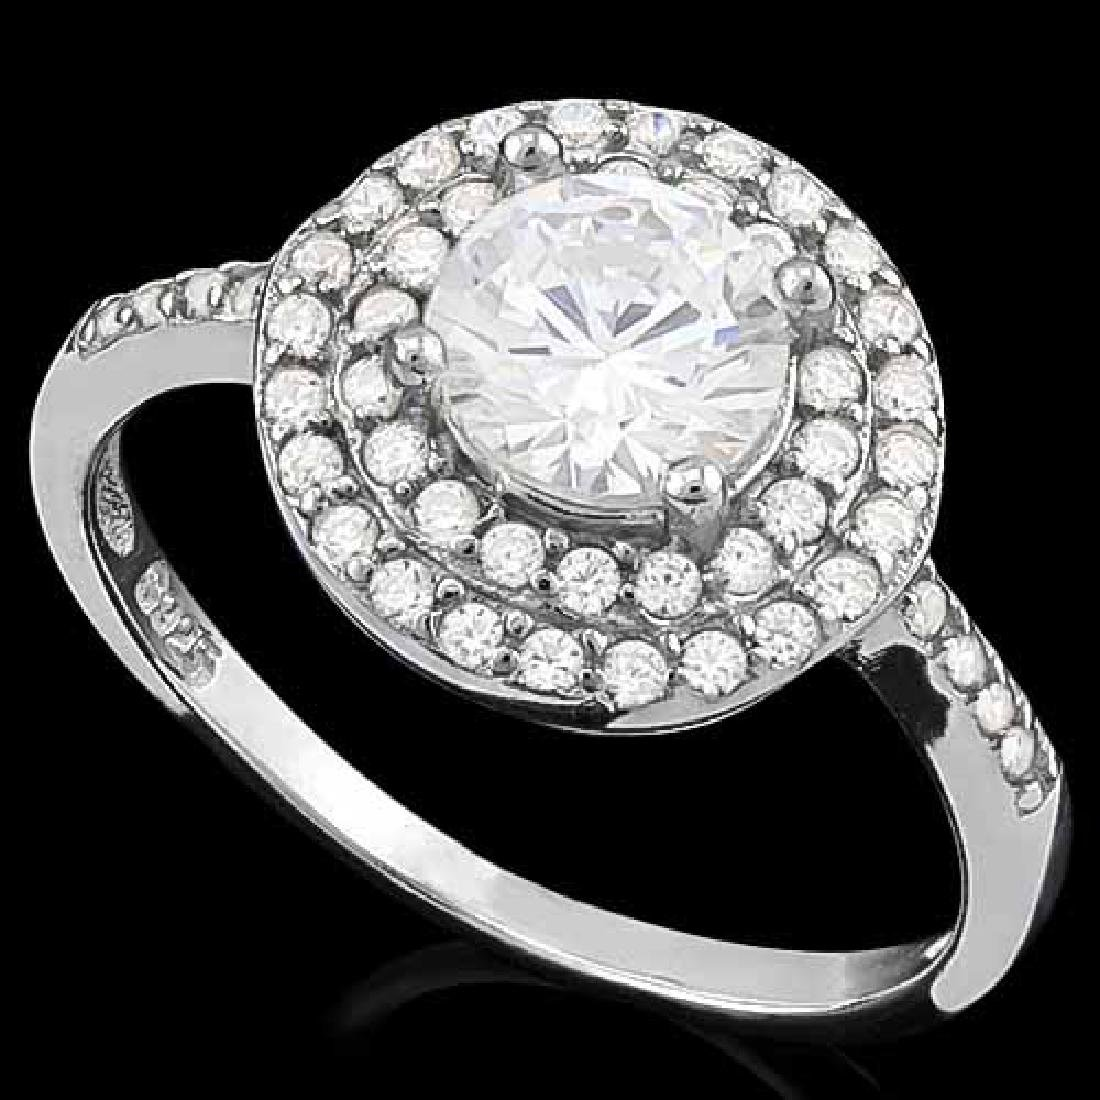 1 3/4 CARAT (48 PCS) FLAWLESS CREATED DIAMOND 925 STERL